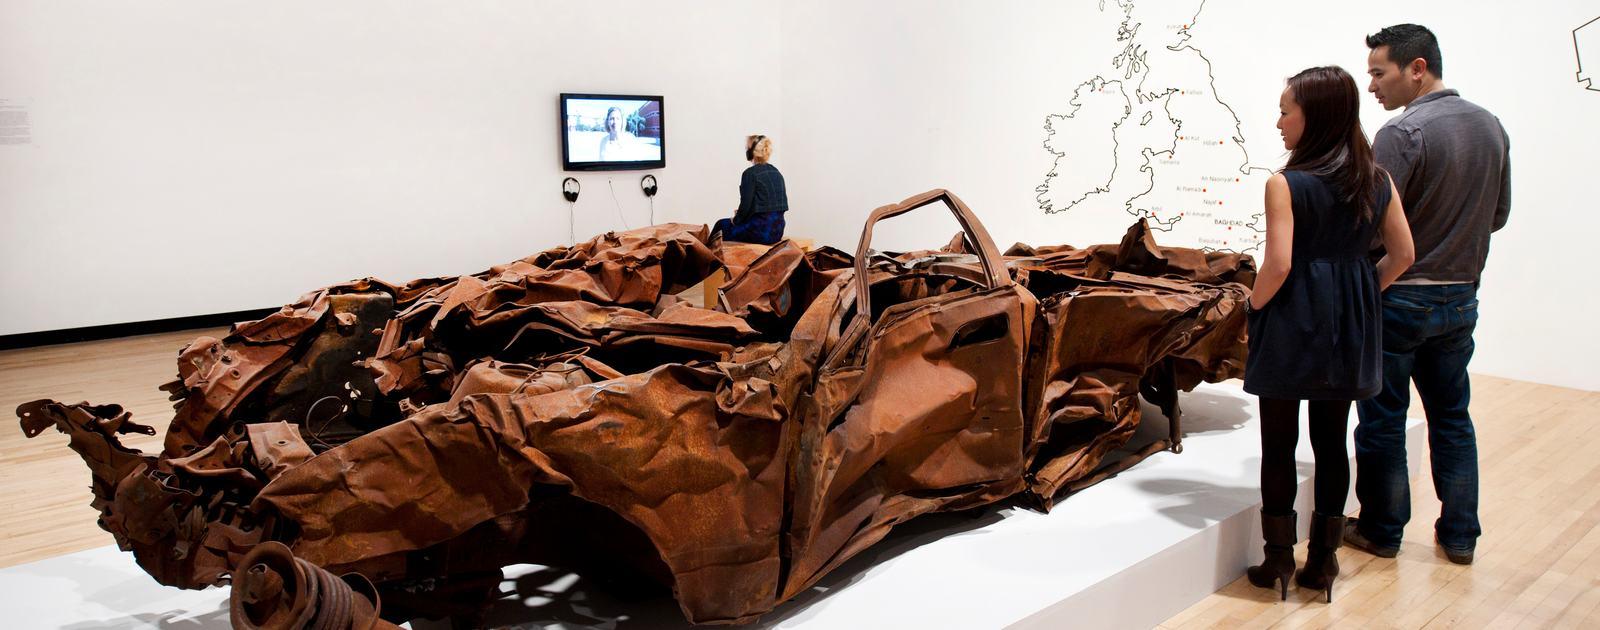 Jeremy Deller: Joy in People. .Hayward Gallery, Southbank Centre, London. .Photo by Linda Nylind. 19/2/2012.